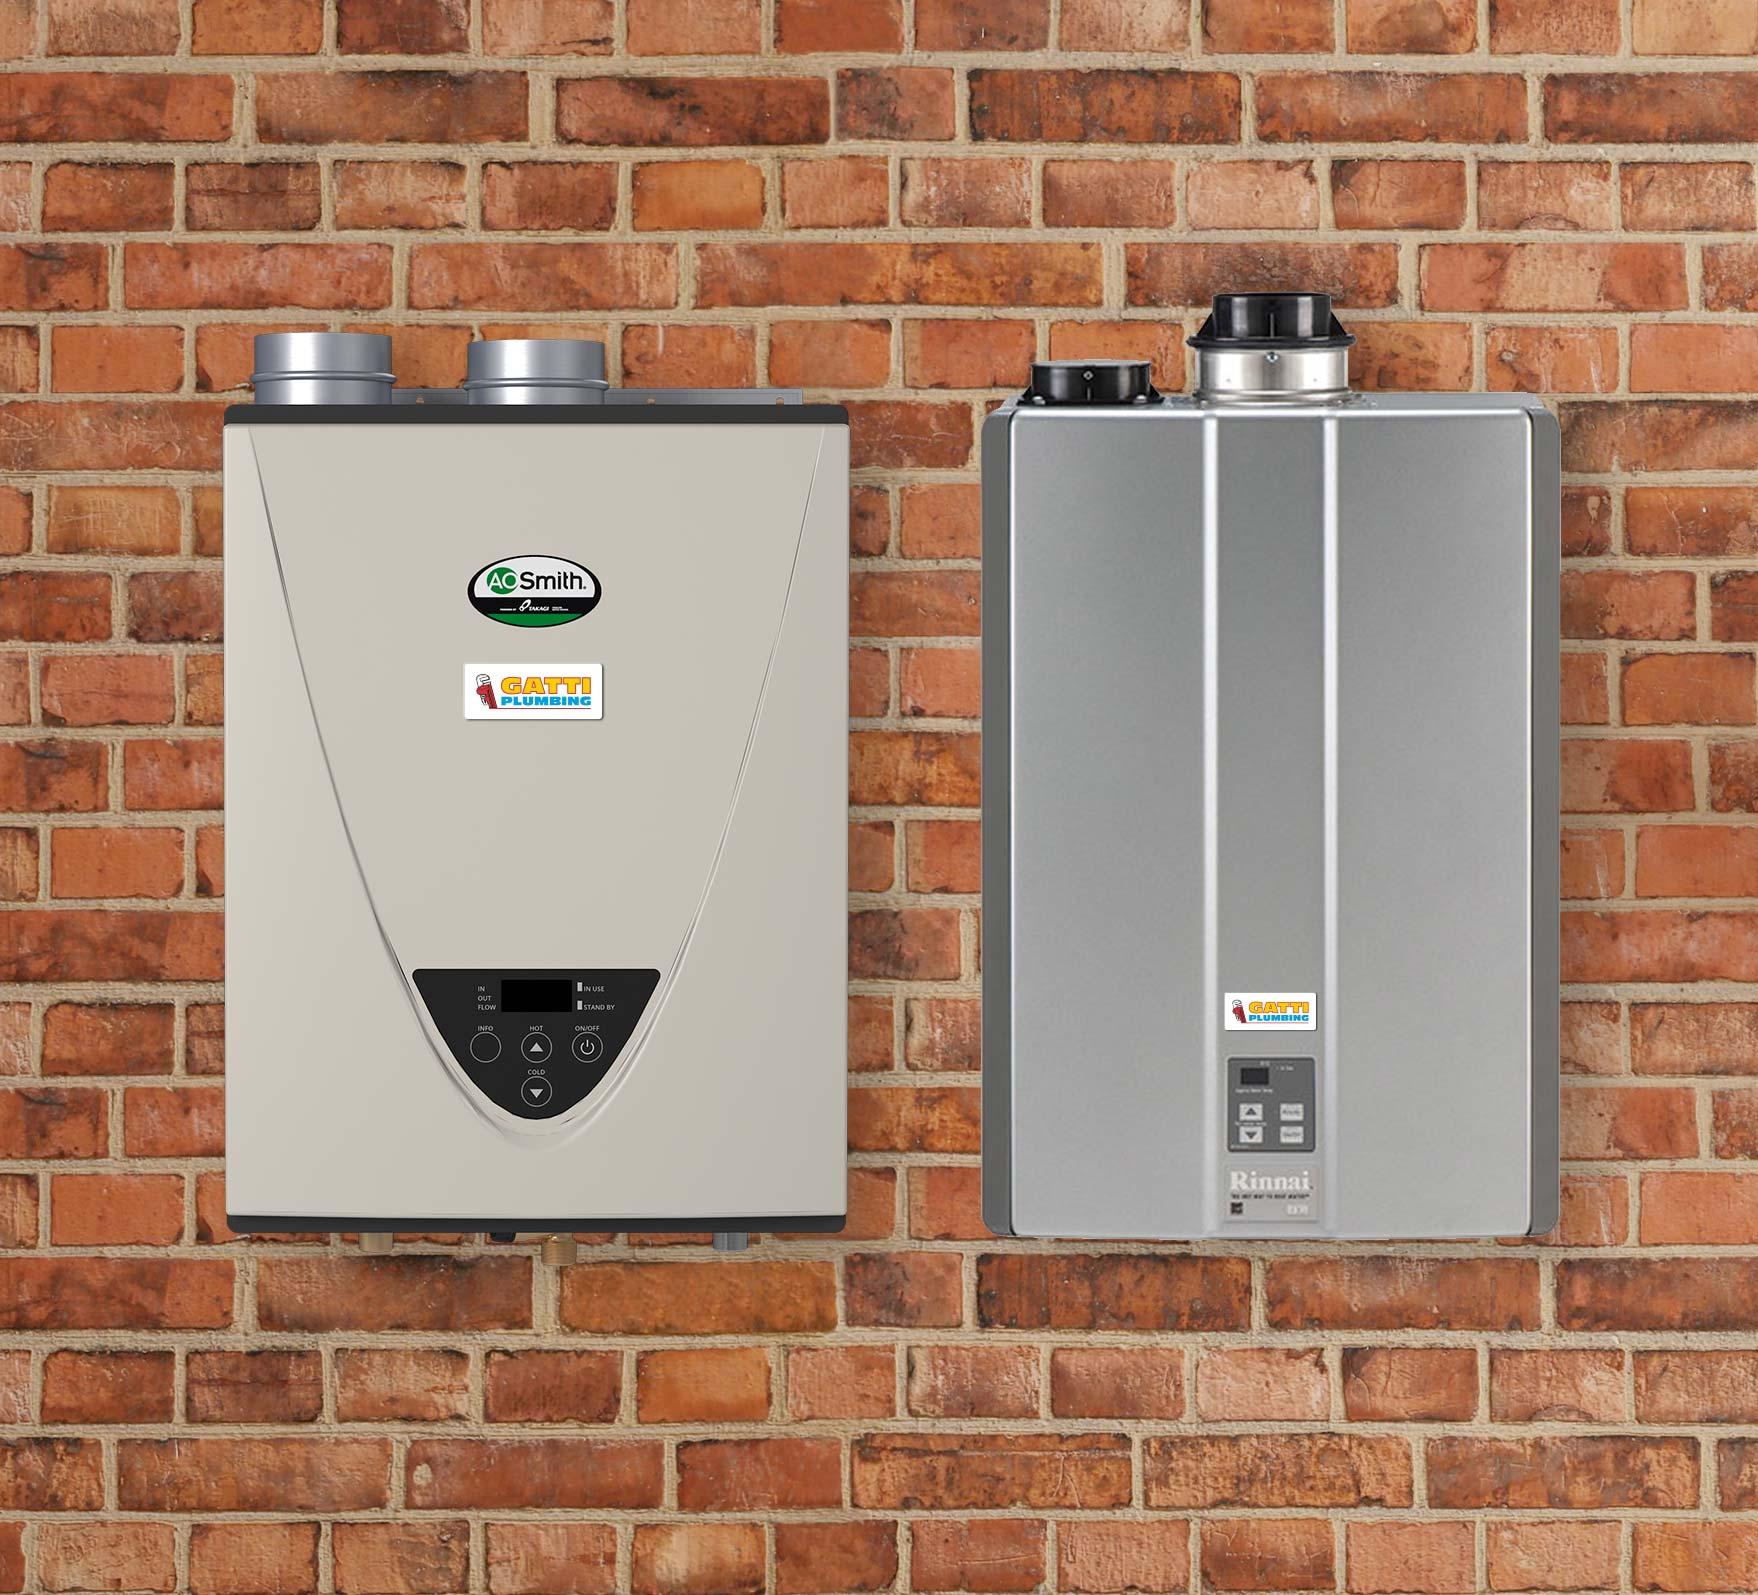 gatti-plumbing-tankless-water-heater-installation-repair